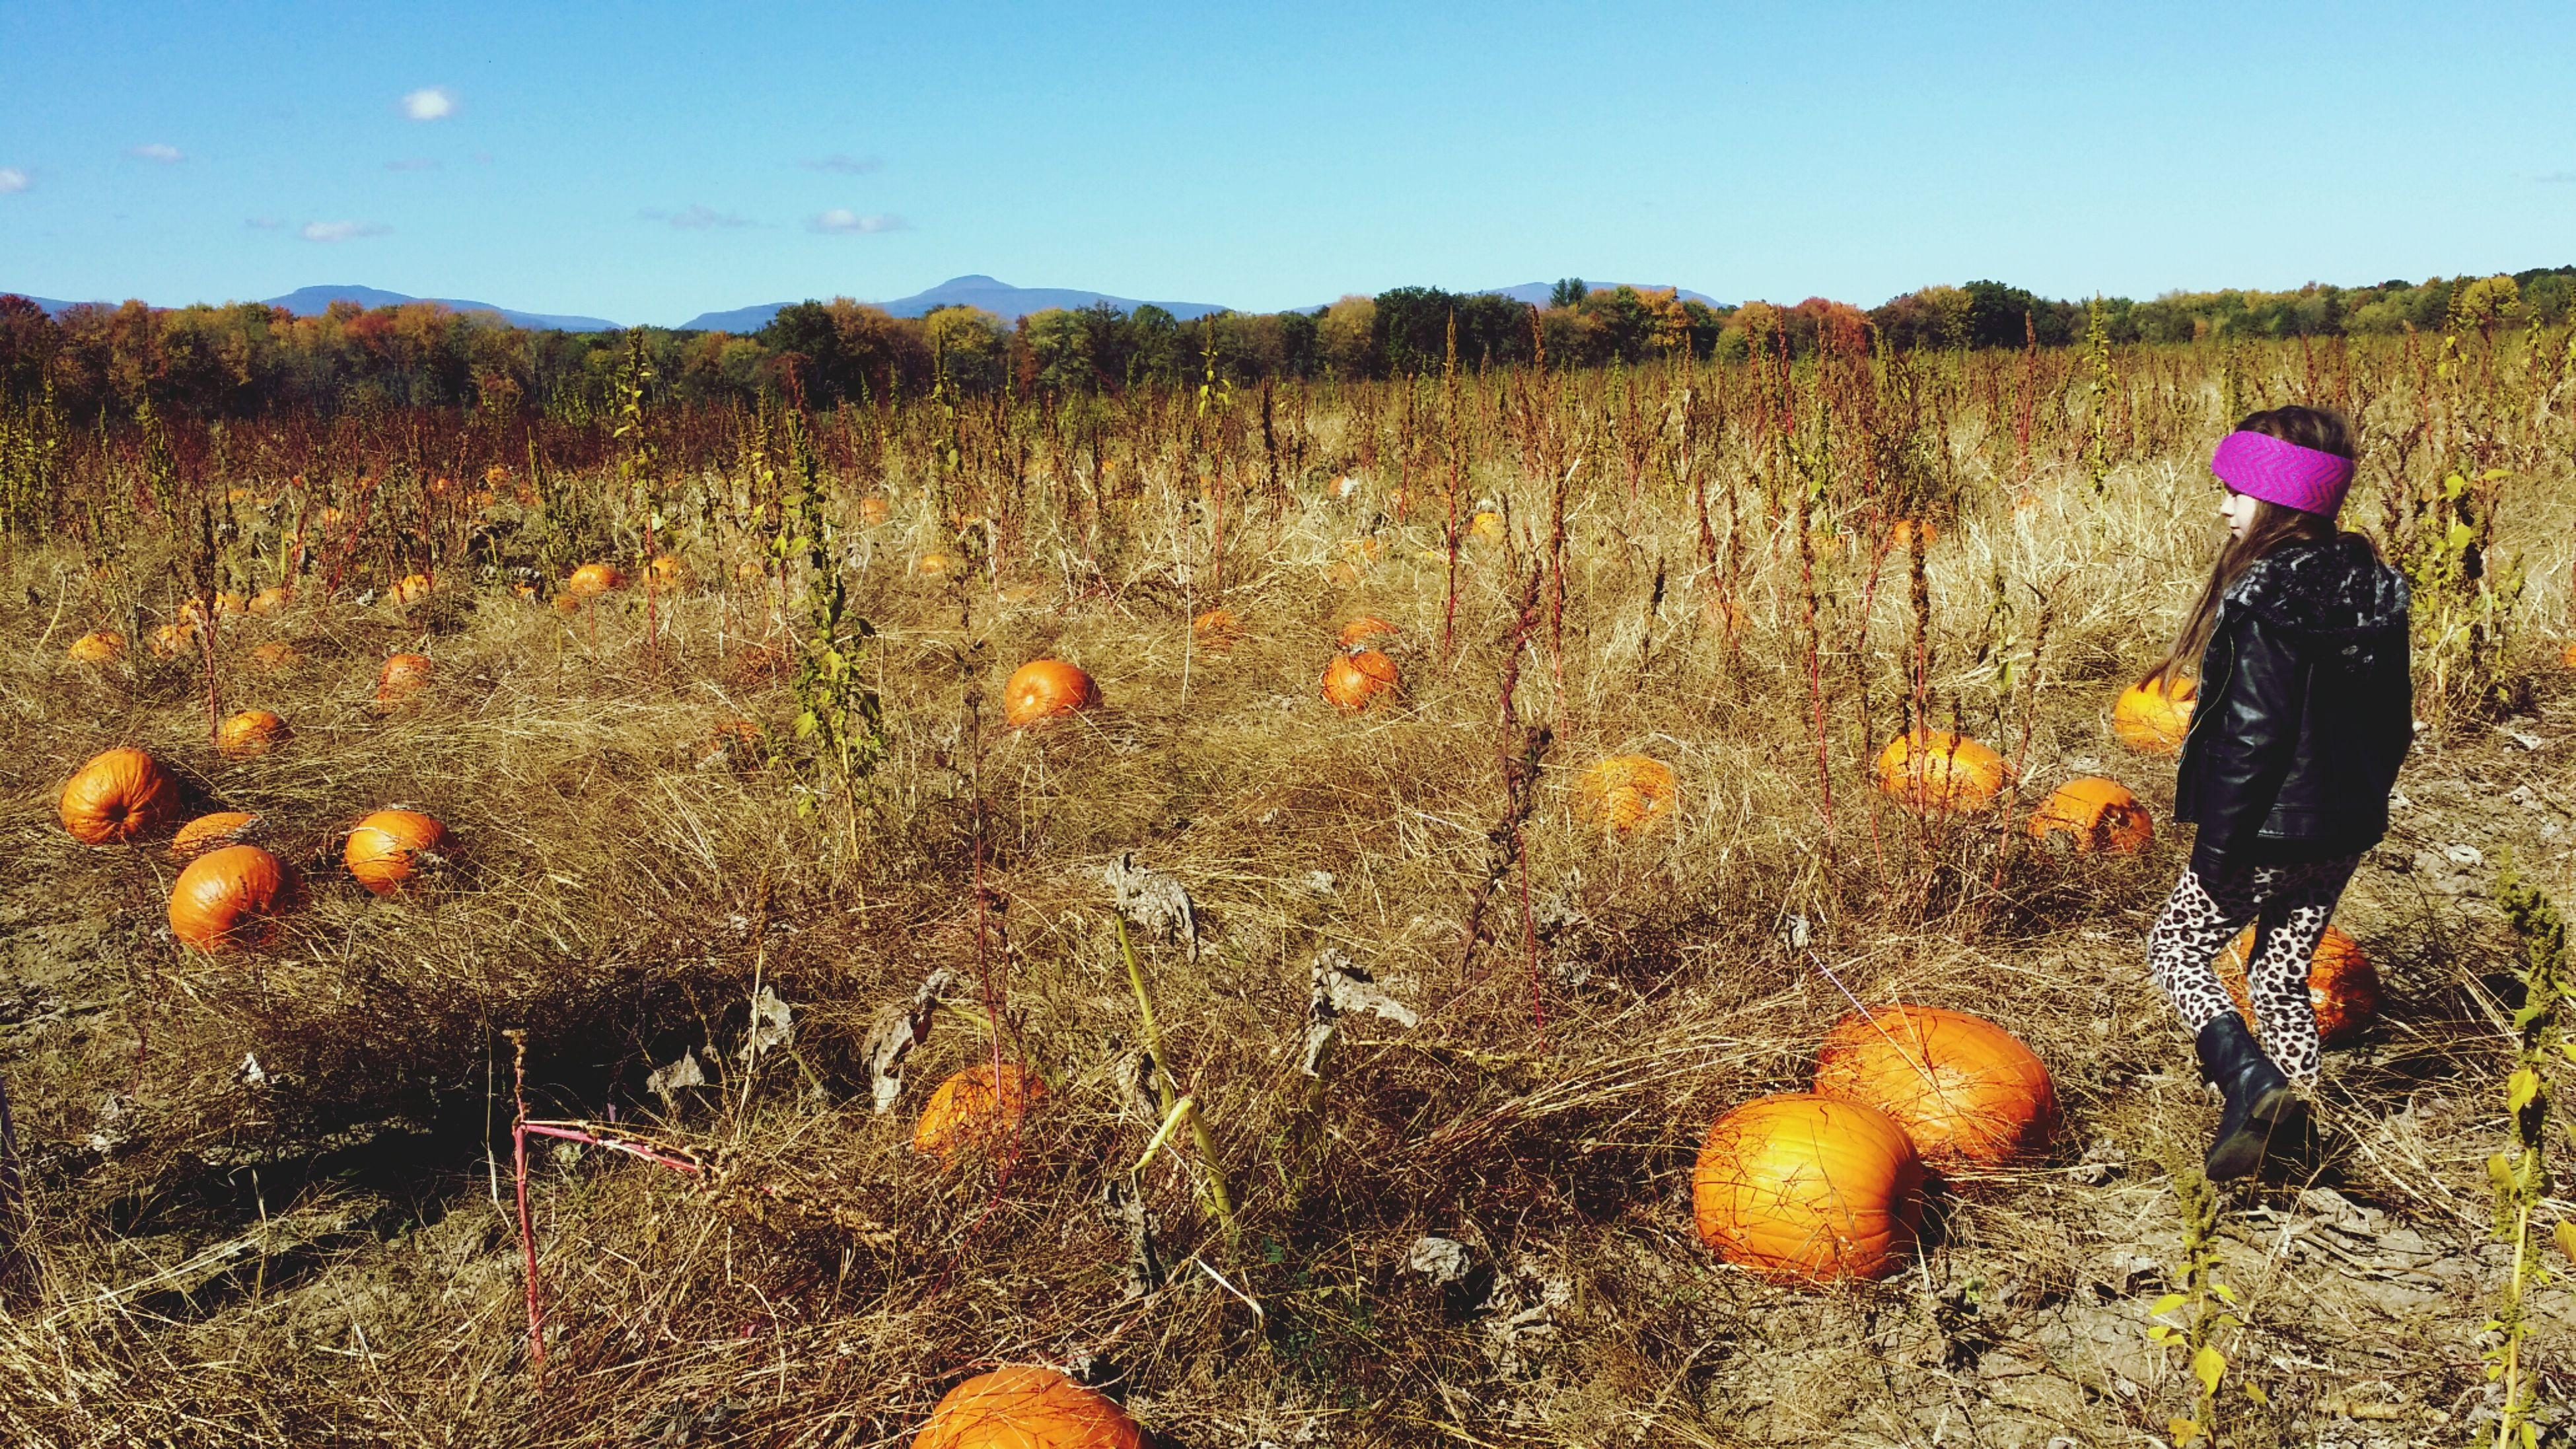 Pumkin patch in Rhinebeck, NY Greigfarm Pumpkin Patch Pumpkins Fall